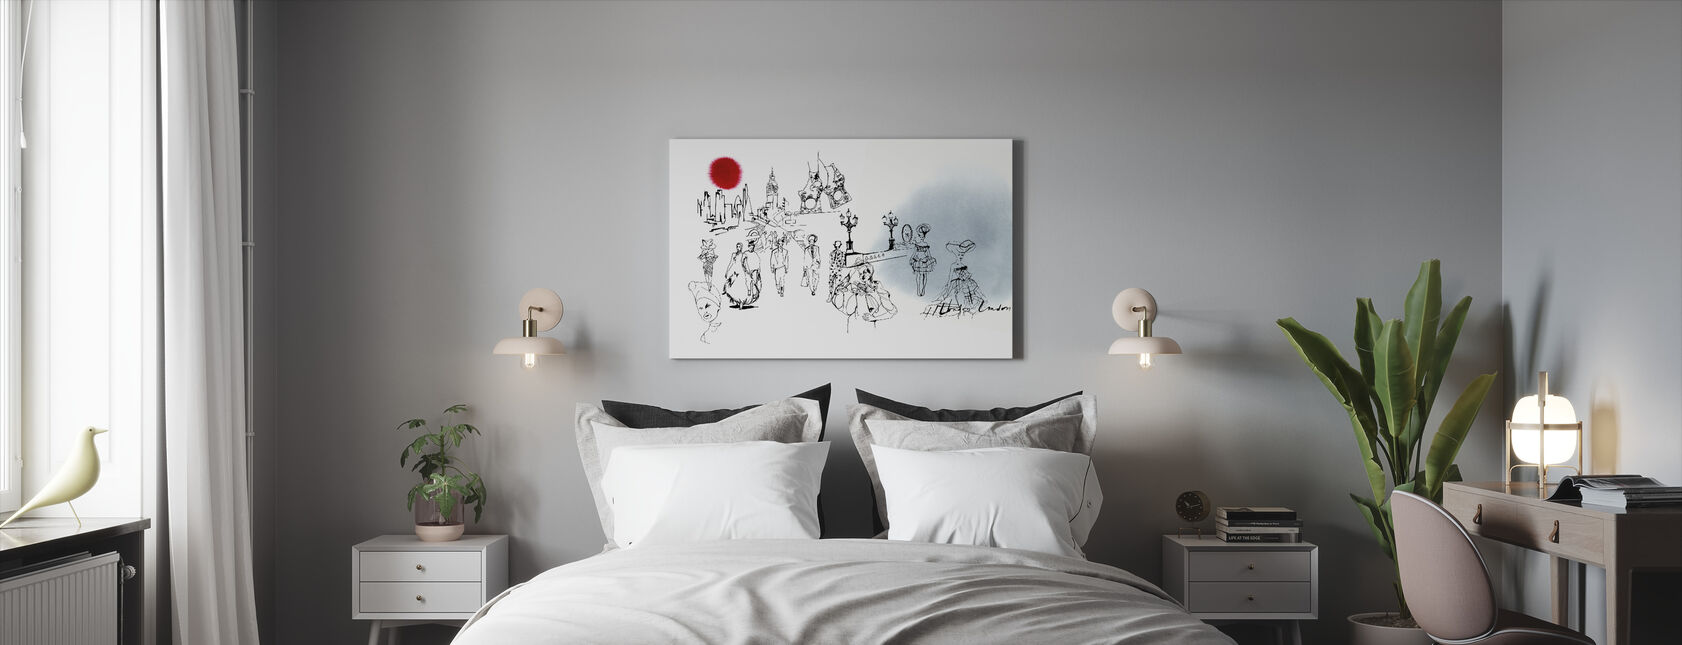 Lontoon painos - Canvastaulu - Makuuhuone